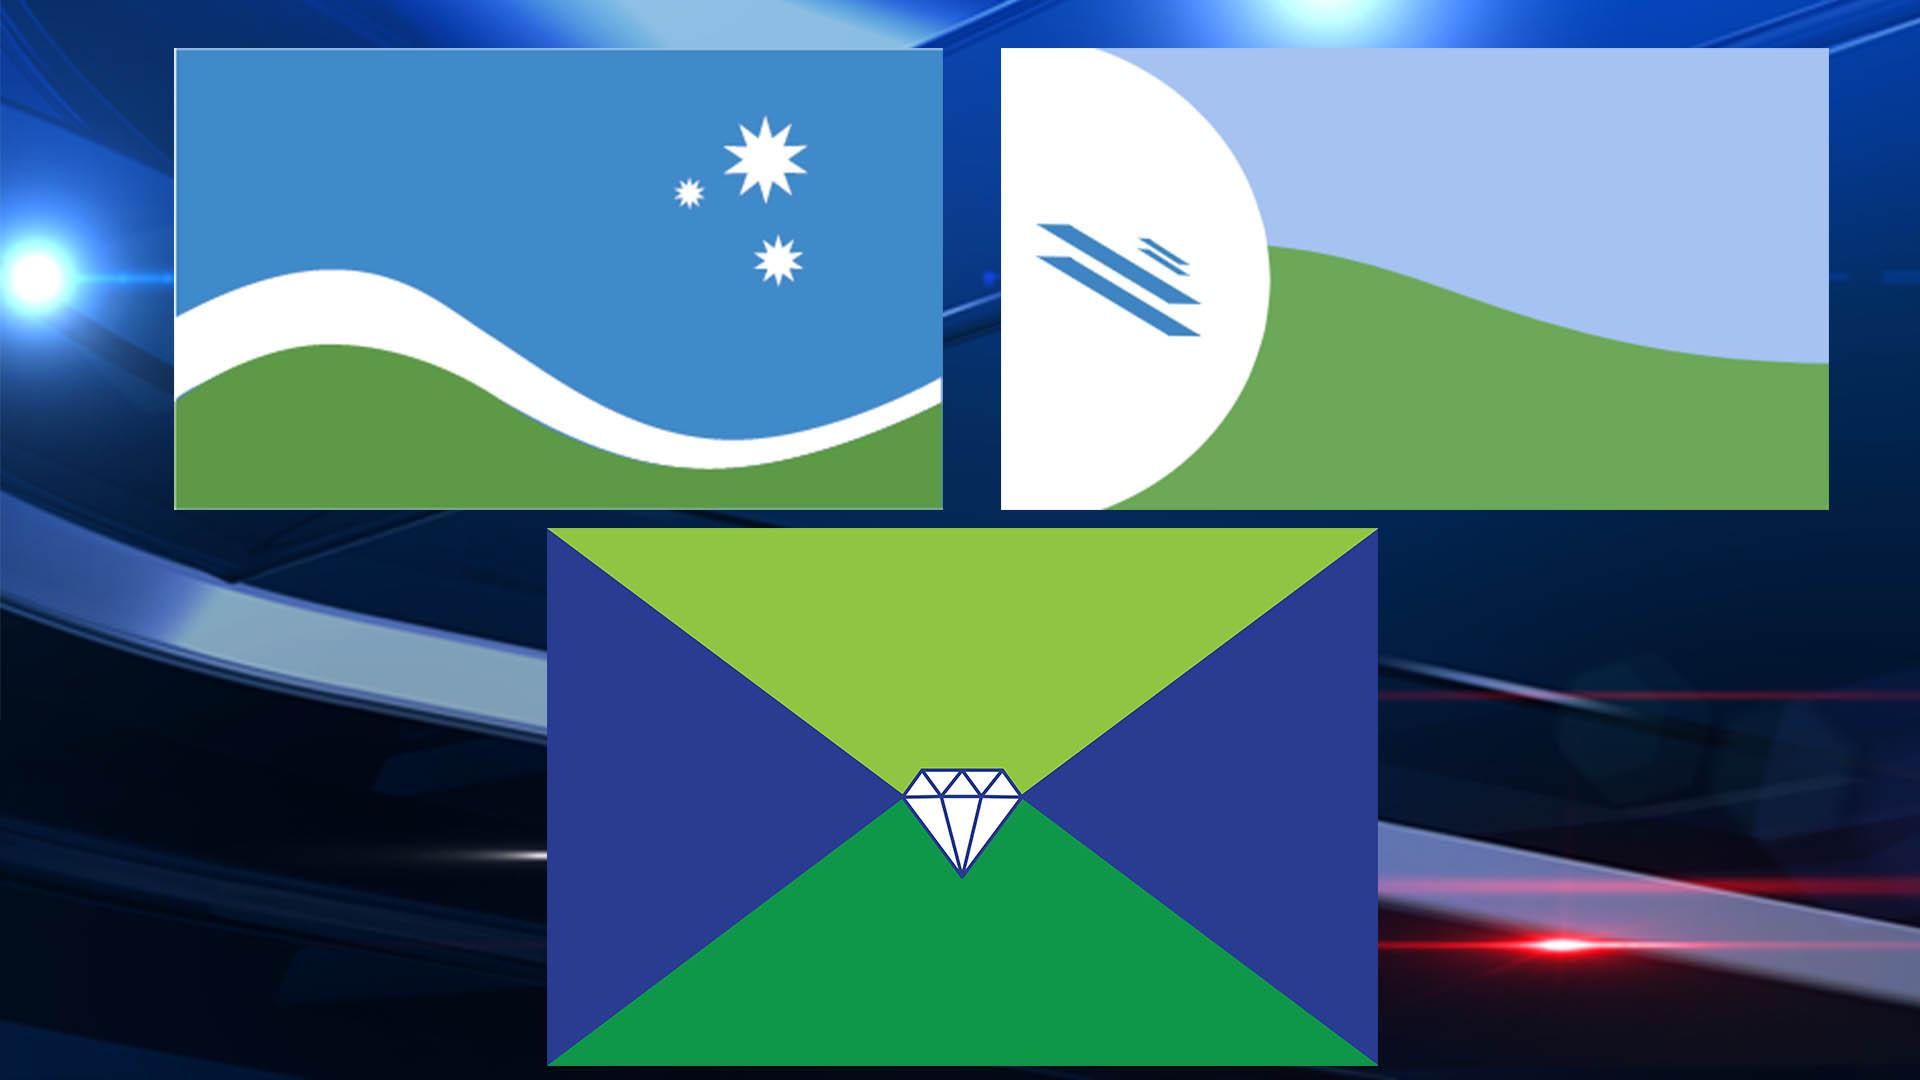 2-26 City of Dayton flag choices